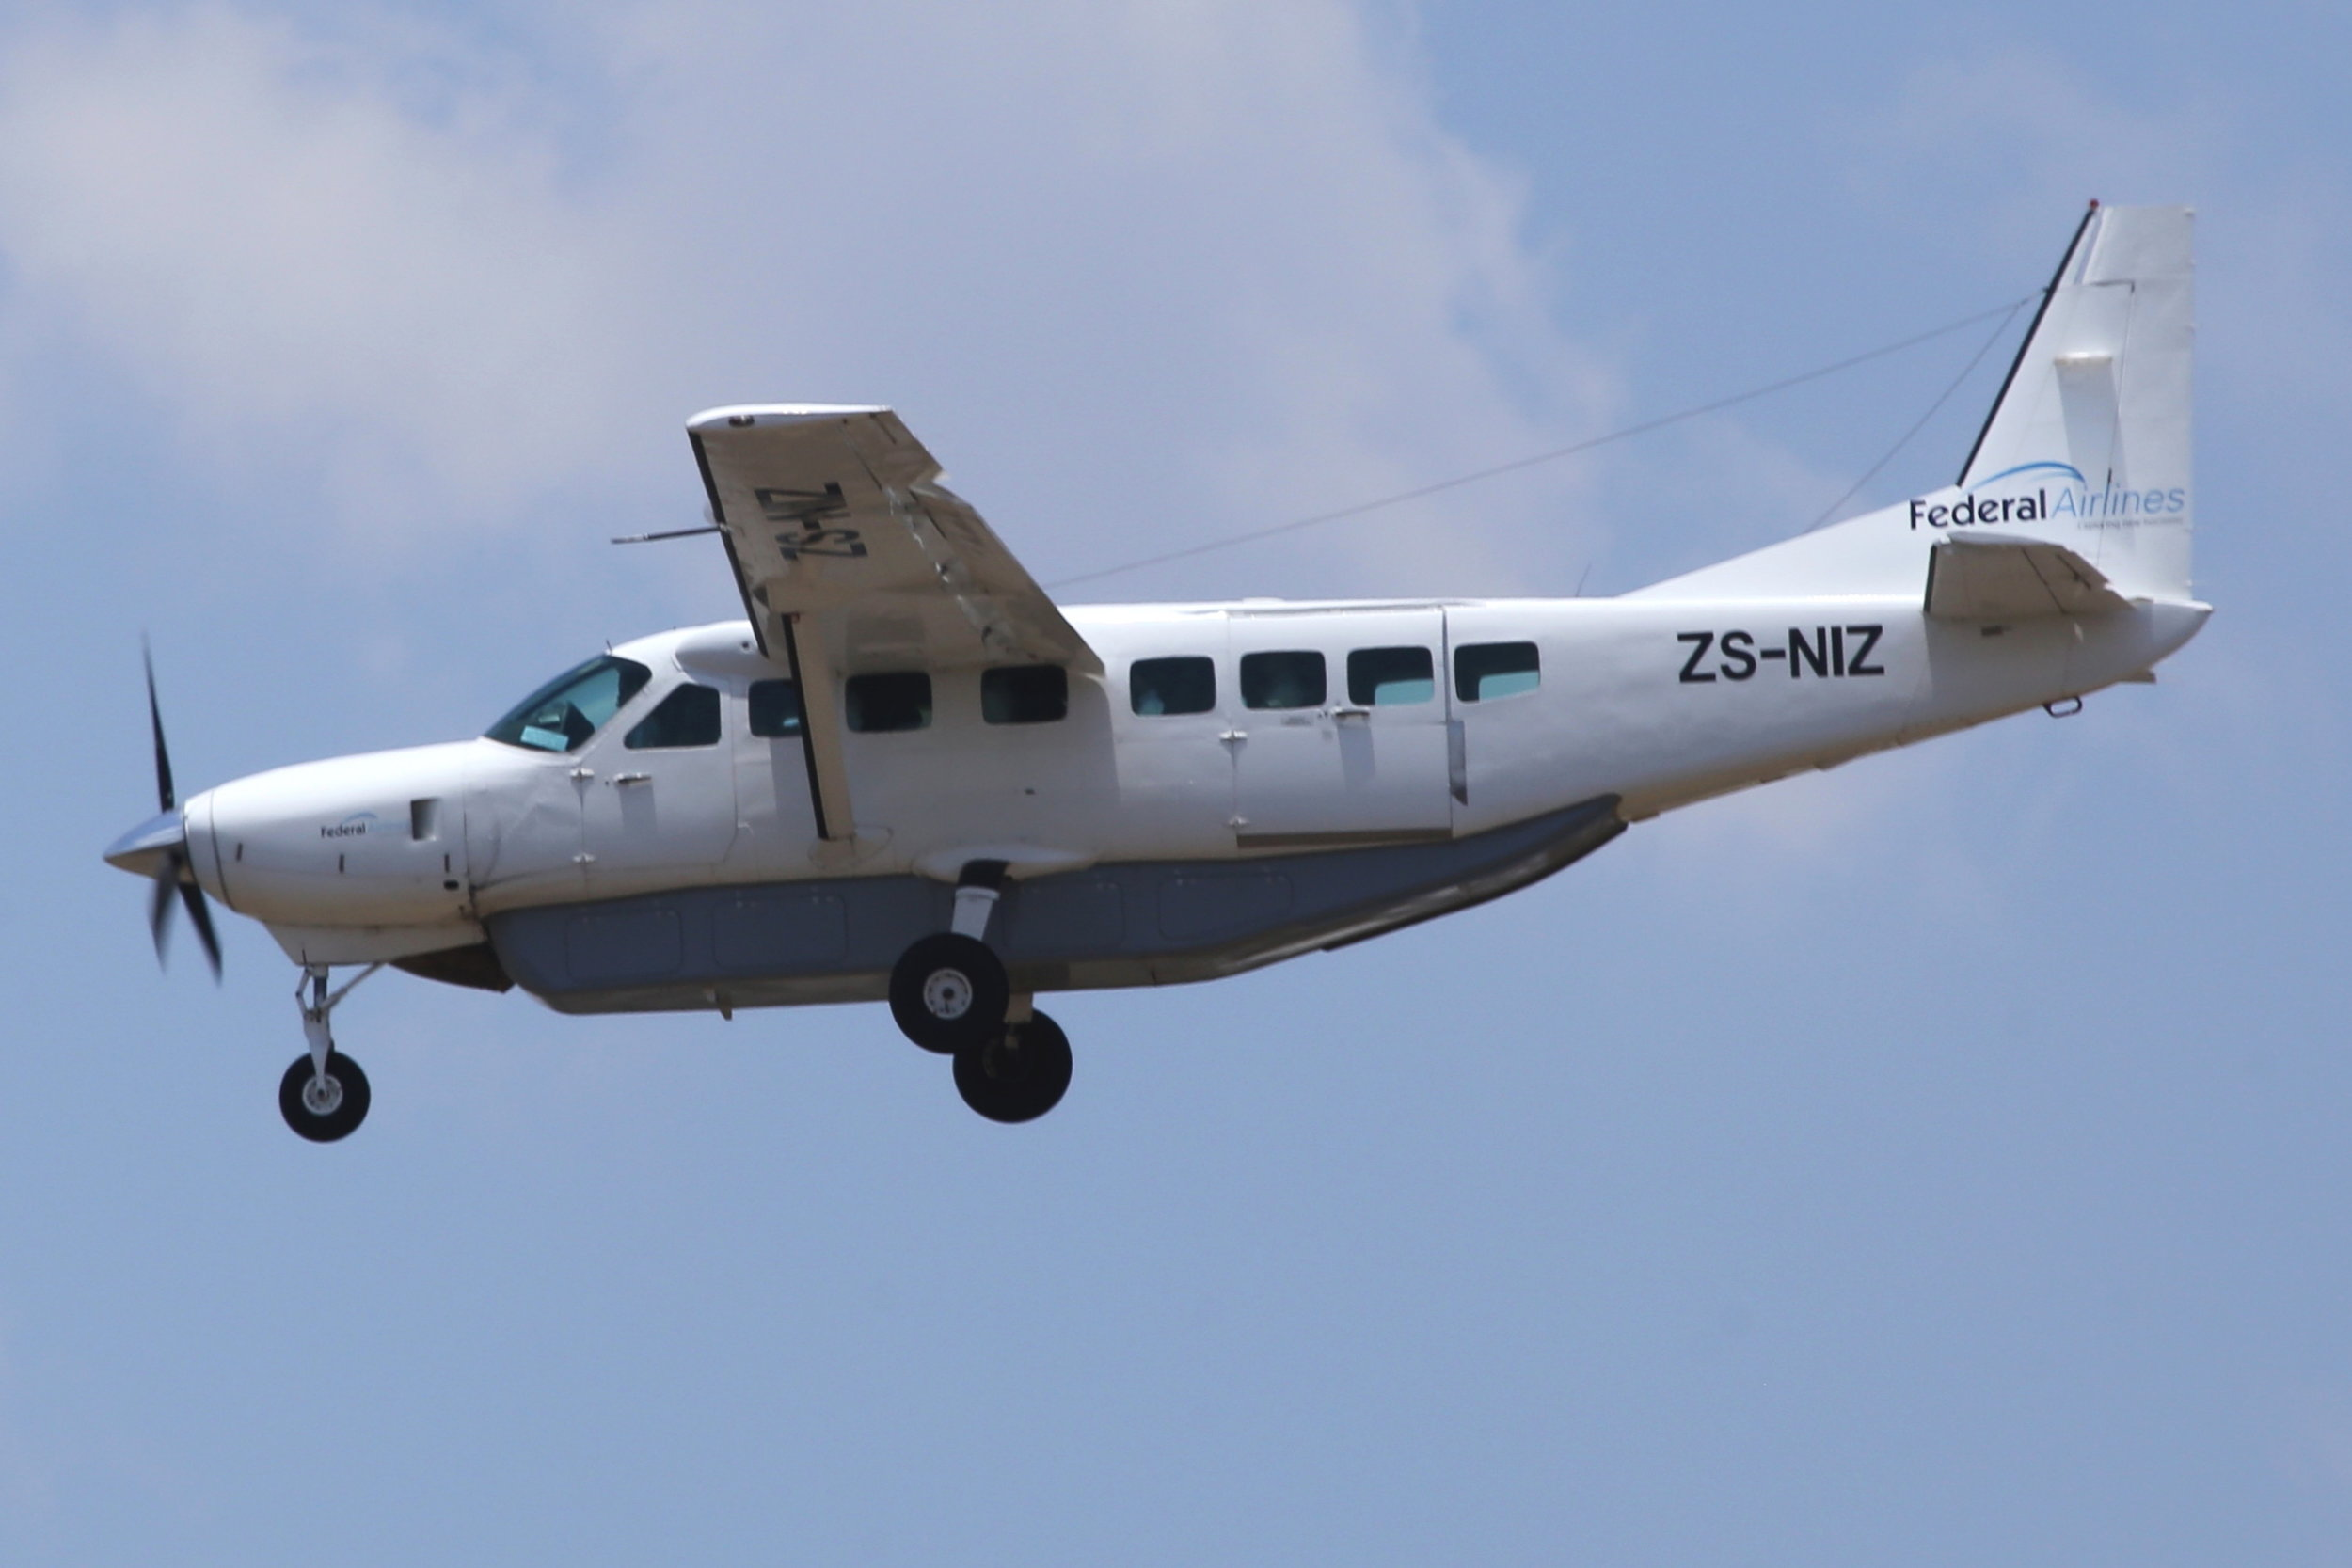 ZS-NIZ Federal Airlines C208 taken at Johannesburg 10th November 2018 by John Wood